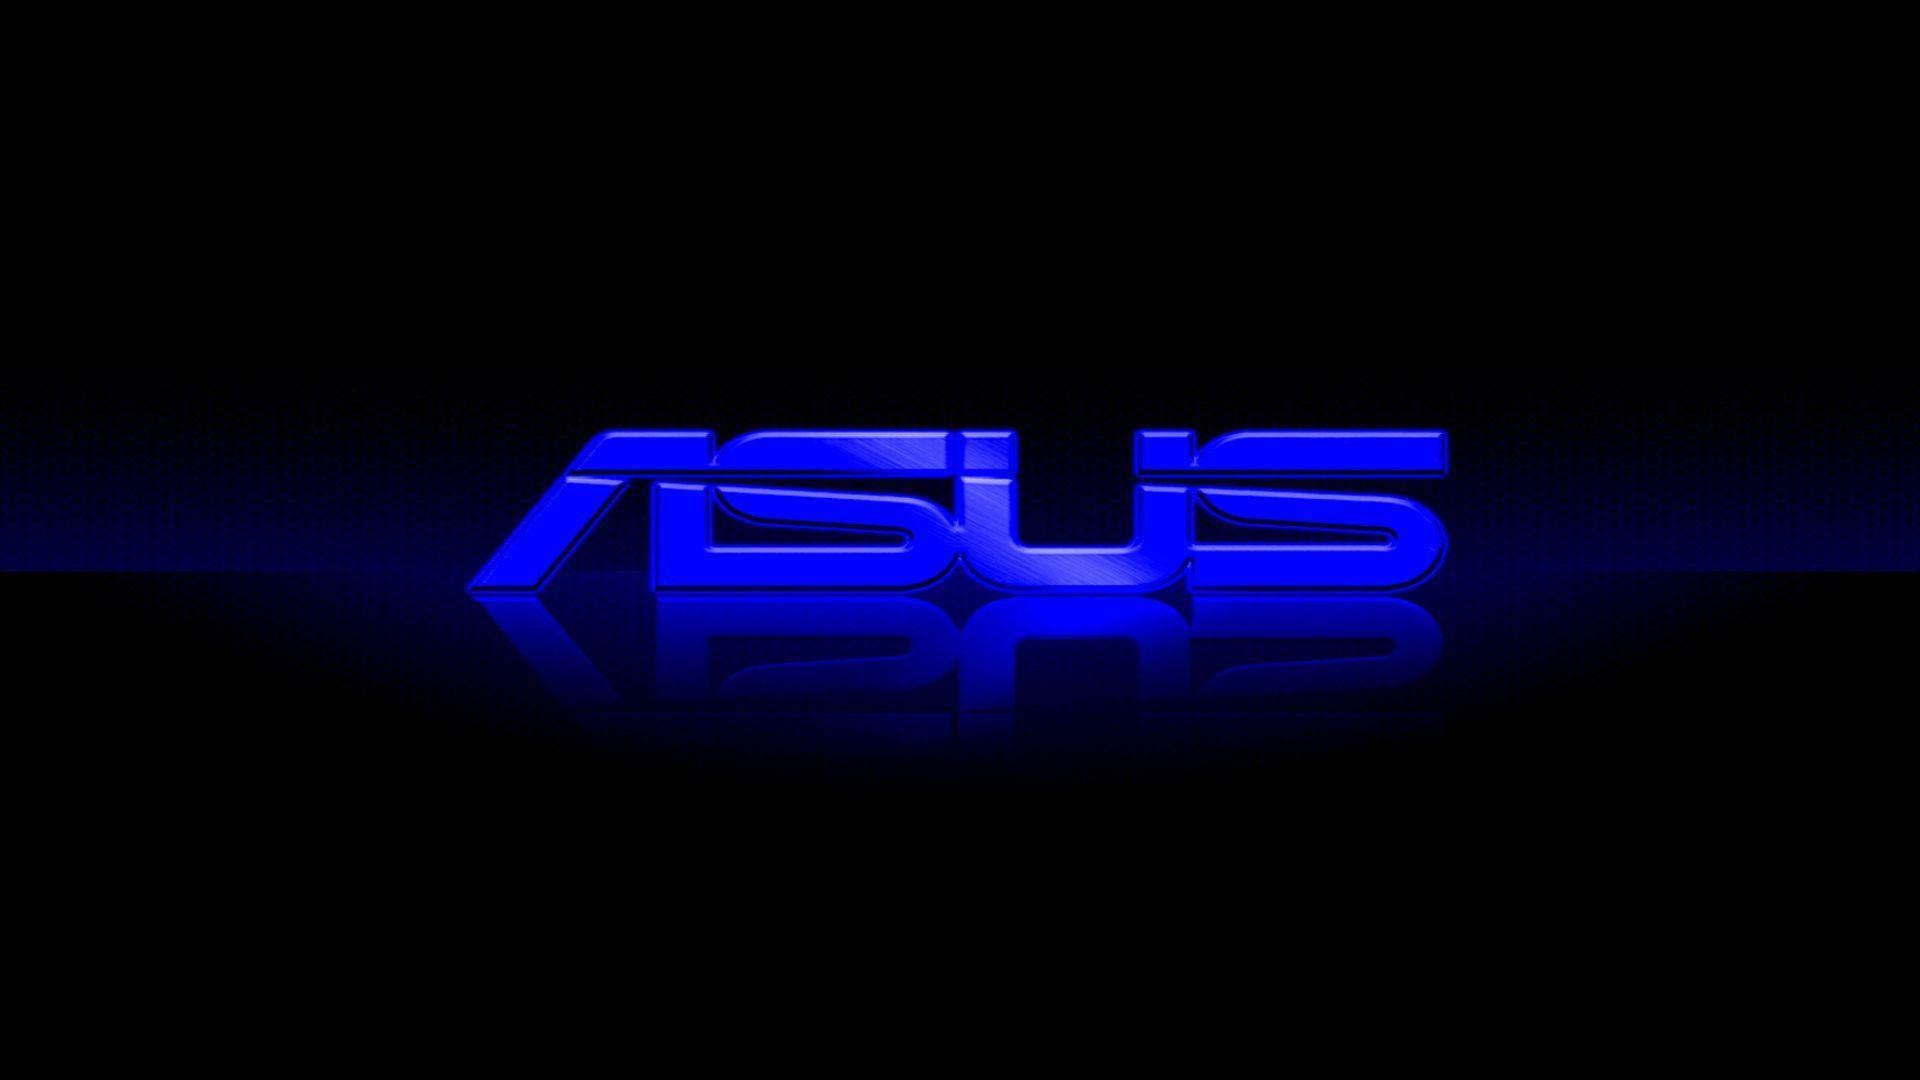 Asus Logo Blue Hd Wallpaper Logo Wallpaper Hd Gaming Wallpapers Hd Logos